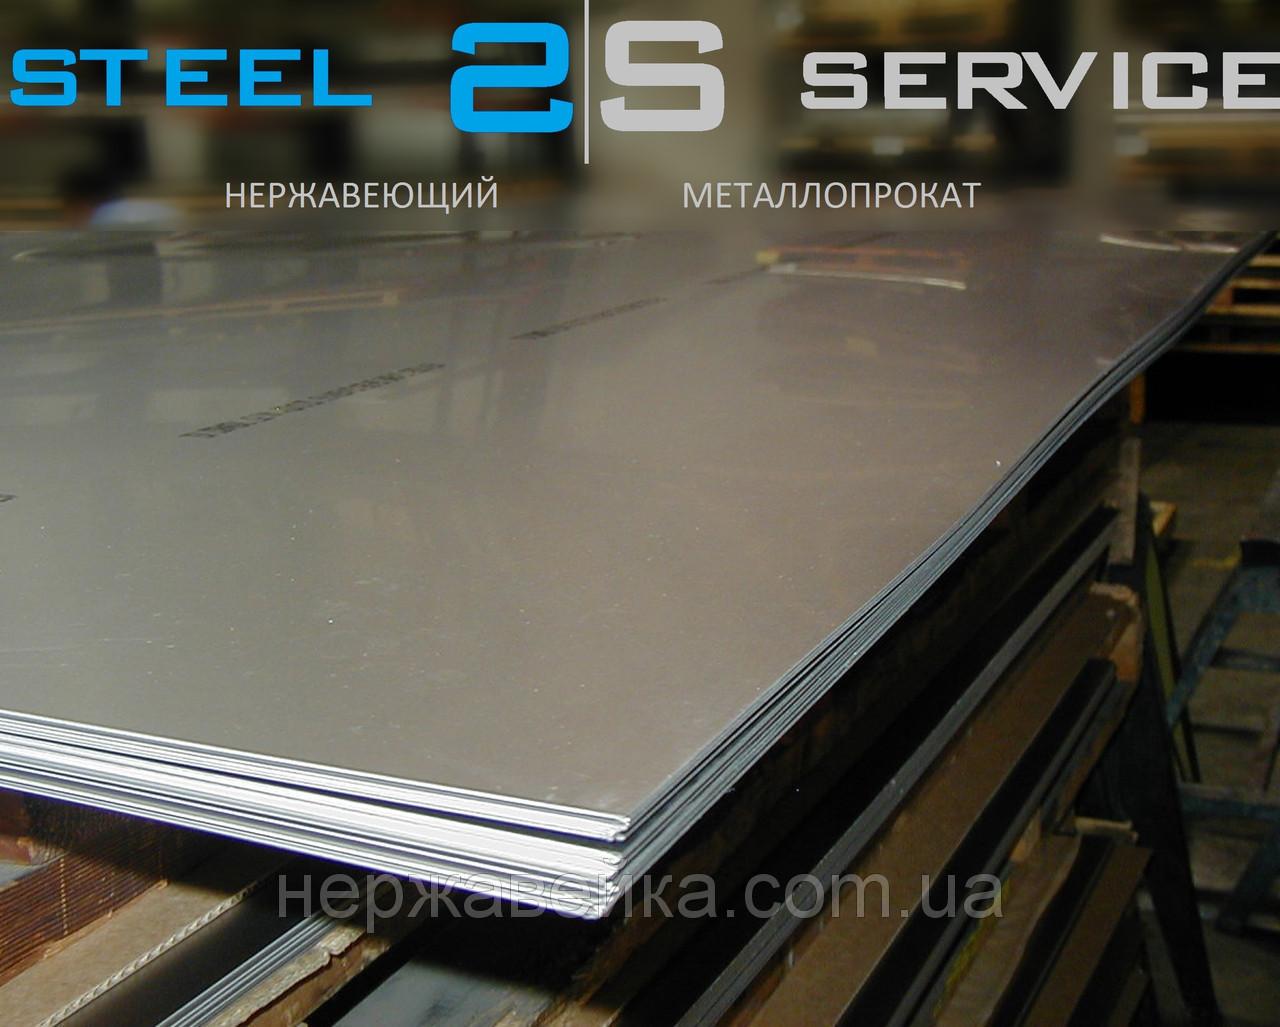 Нержавеющий лист 0,8х1000х2000мм AISI 430(12Х17) 2B - матовый, технический